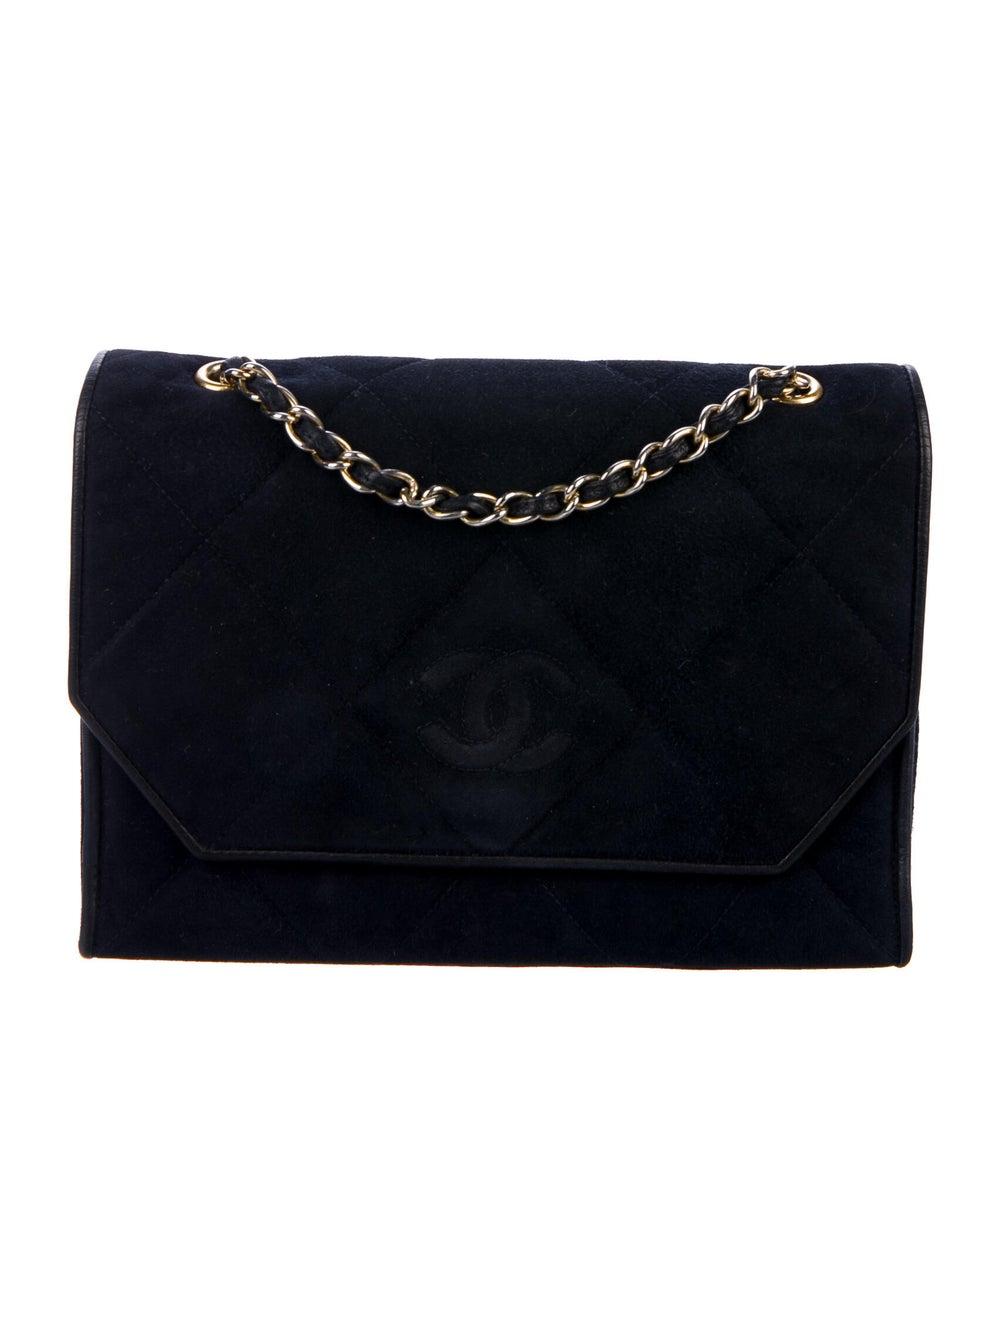 Chanel Vintage Quilted CC Flap Bag Blue - image 1